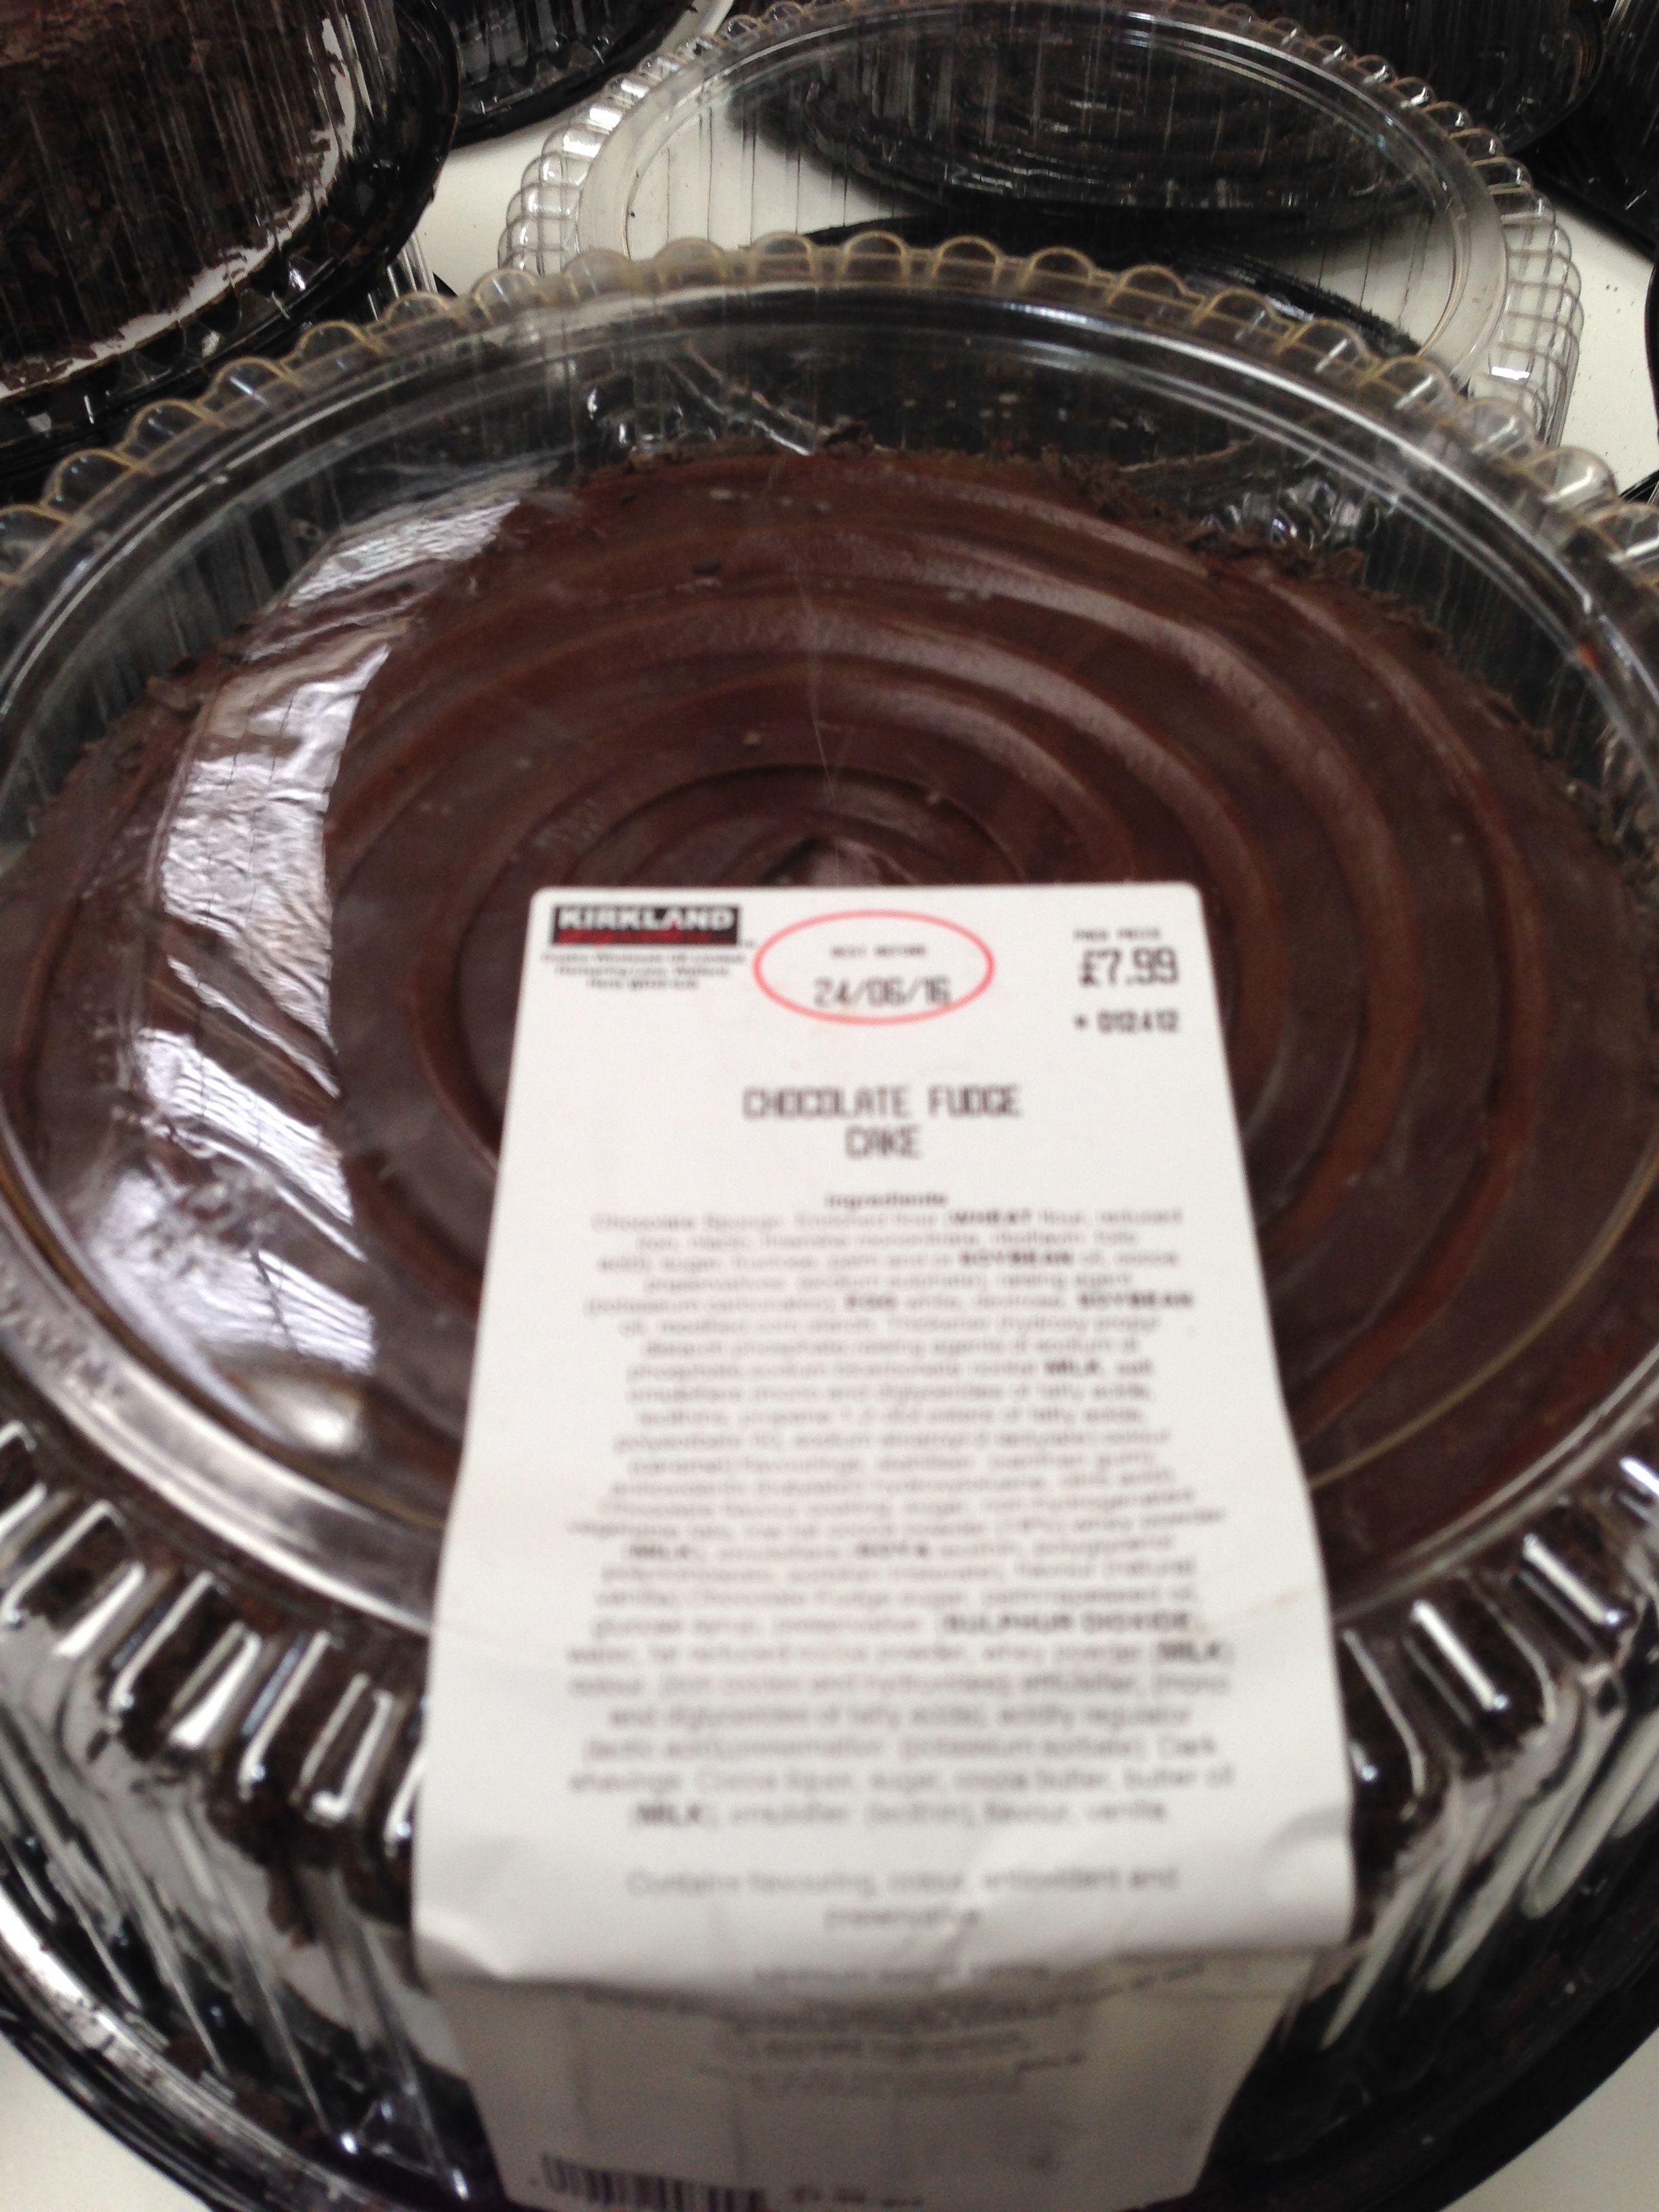 Chocolate Fudge Cake Costco 163 7 99 Chocolate Fudge Cake